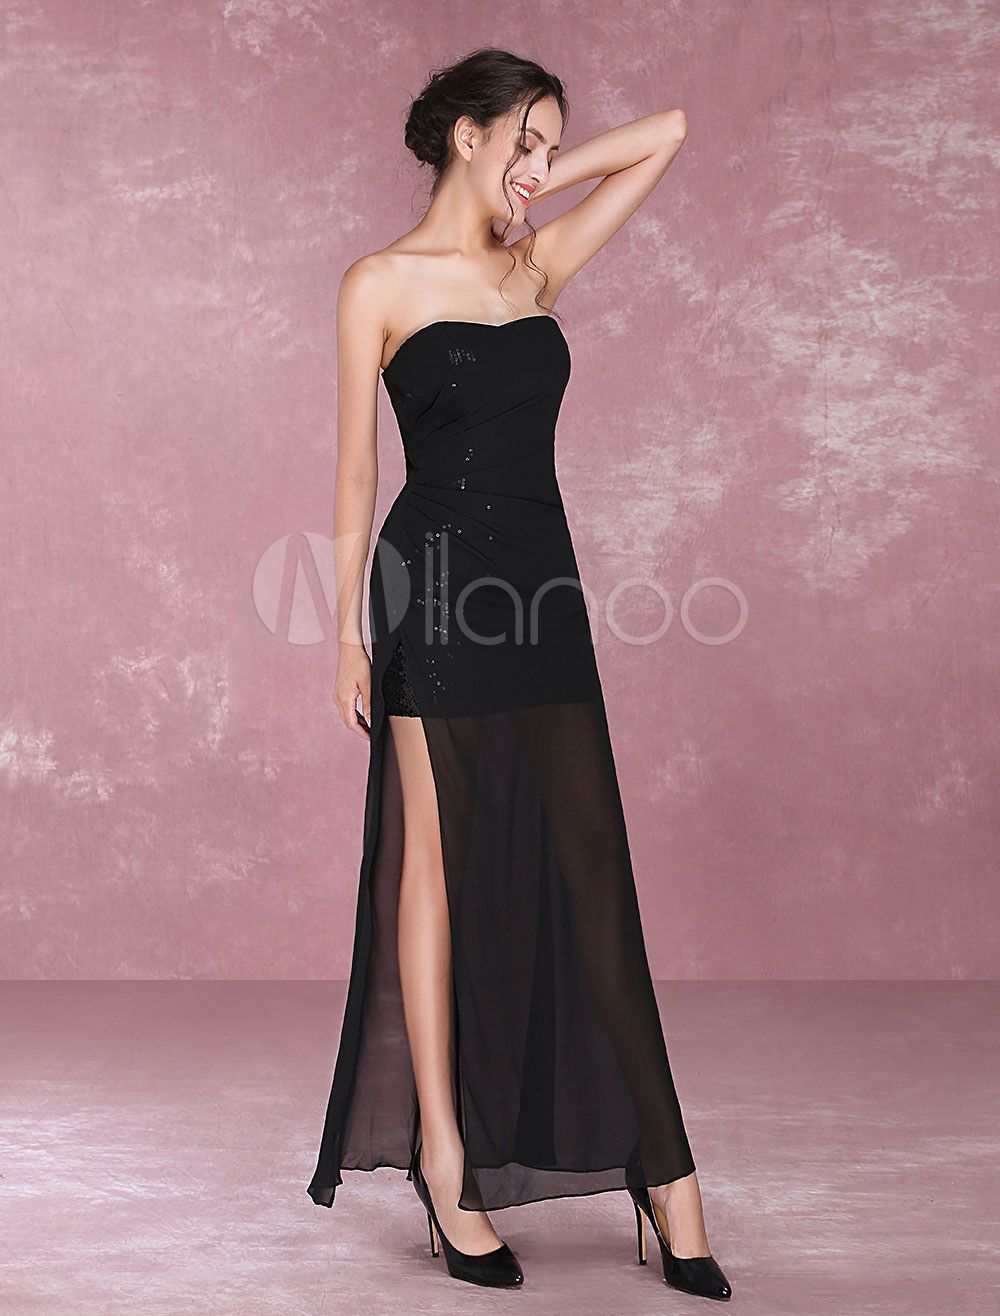 Black Evening Dresses Sexy High Split Illusion Sweetheart Strapless ...